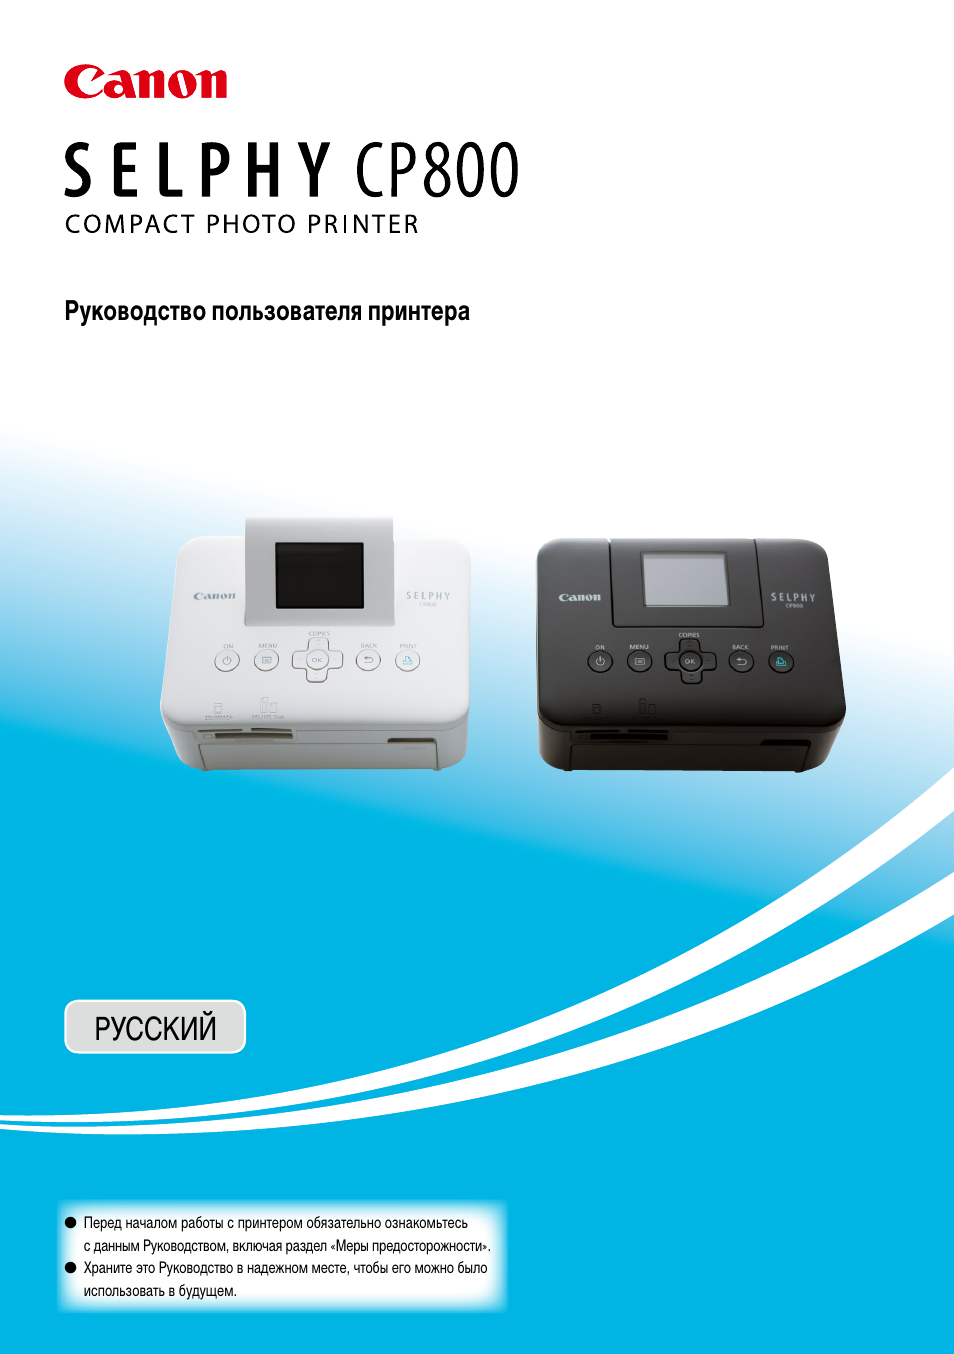 Русские Инструкции Canon Fax